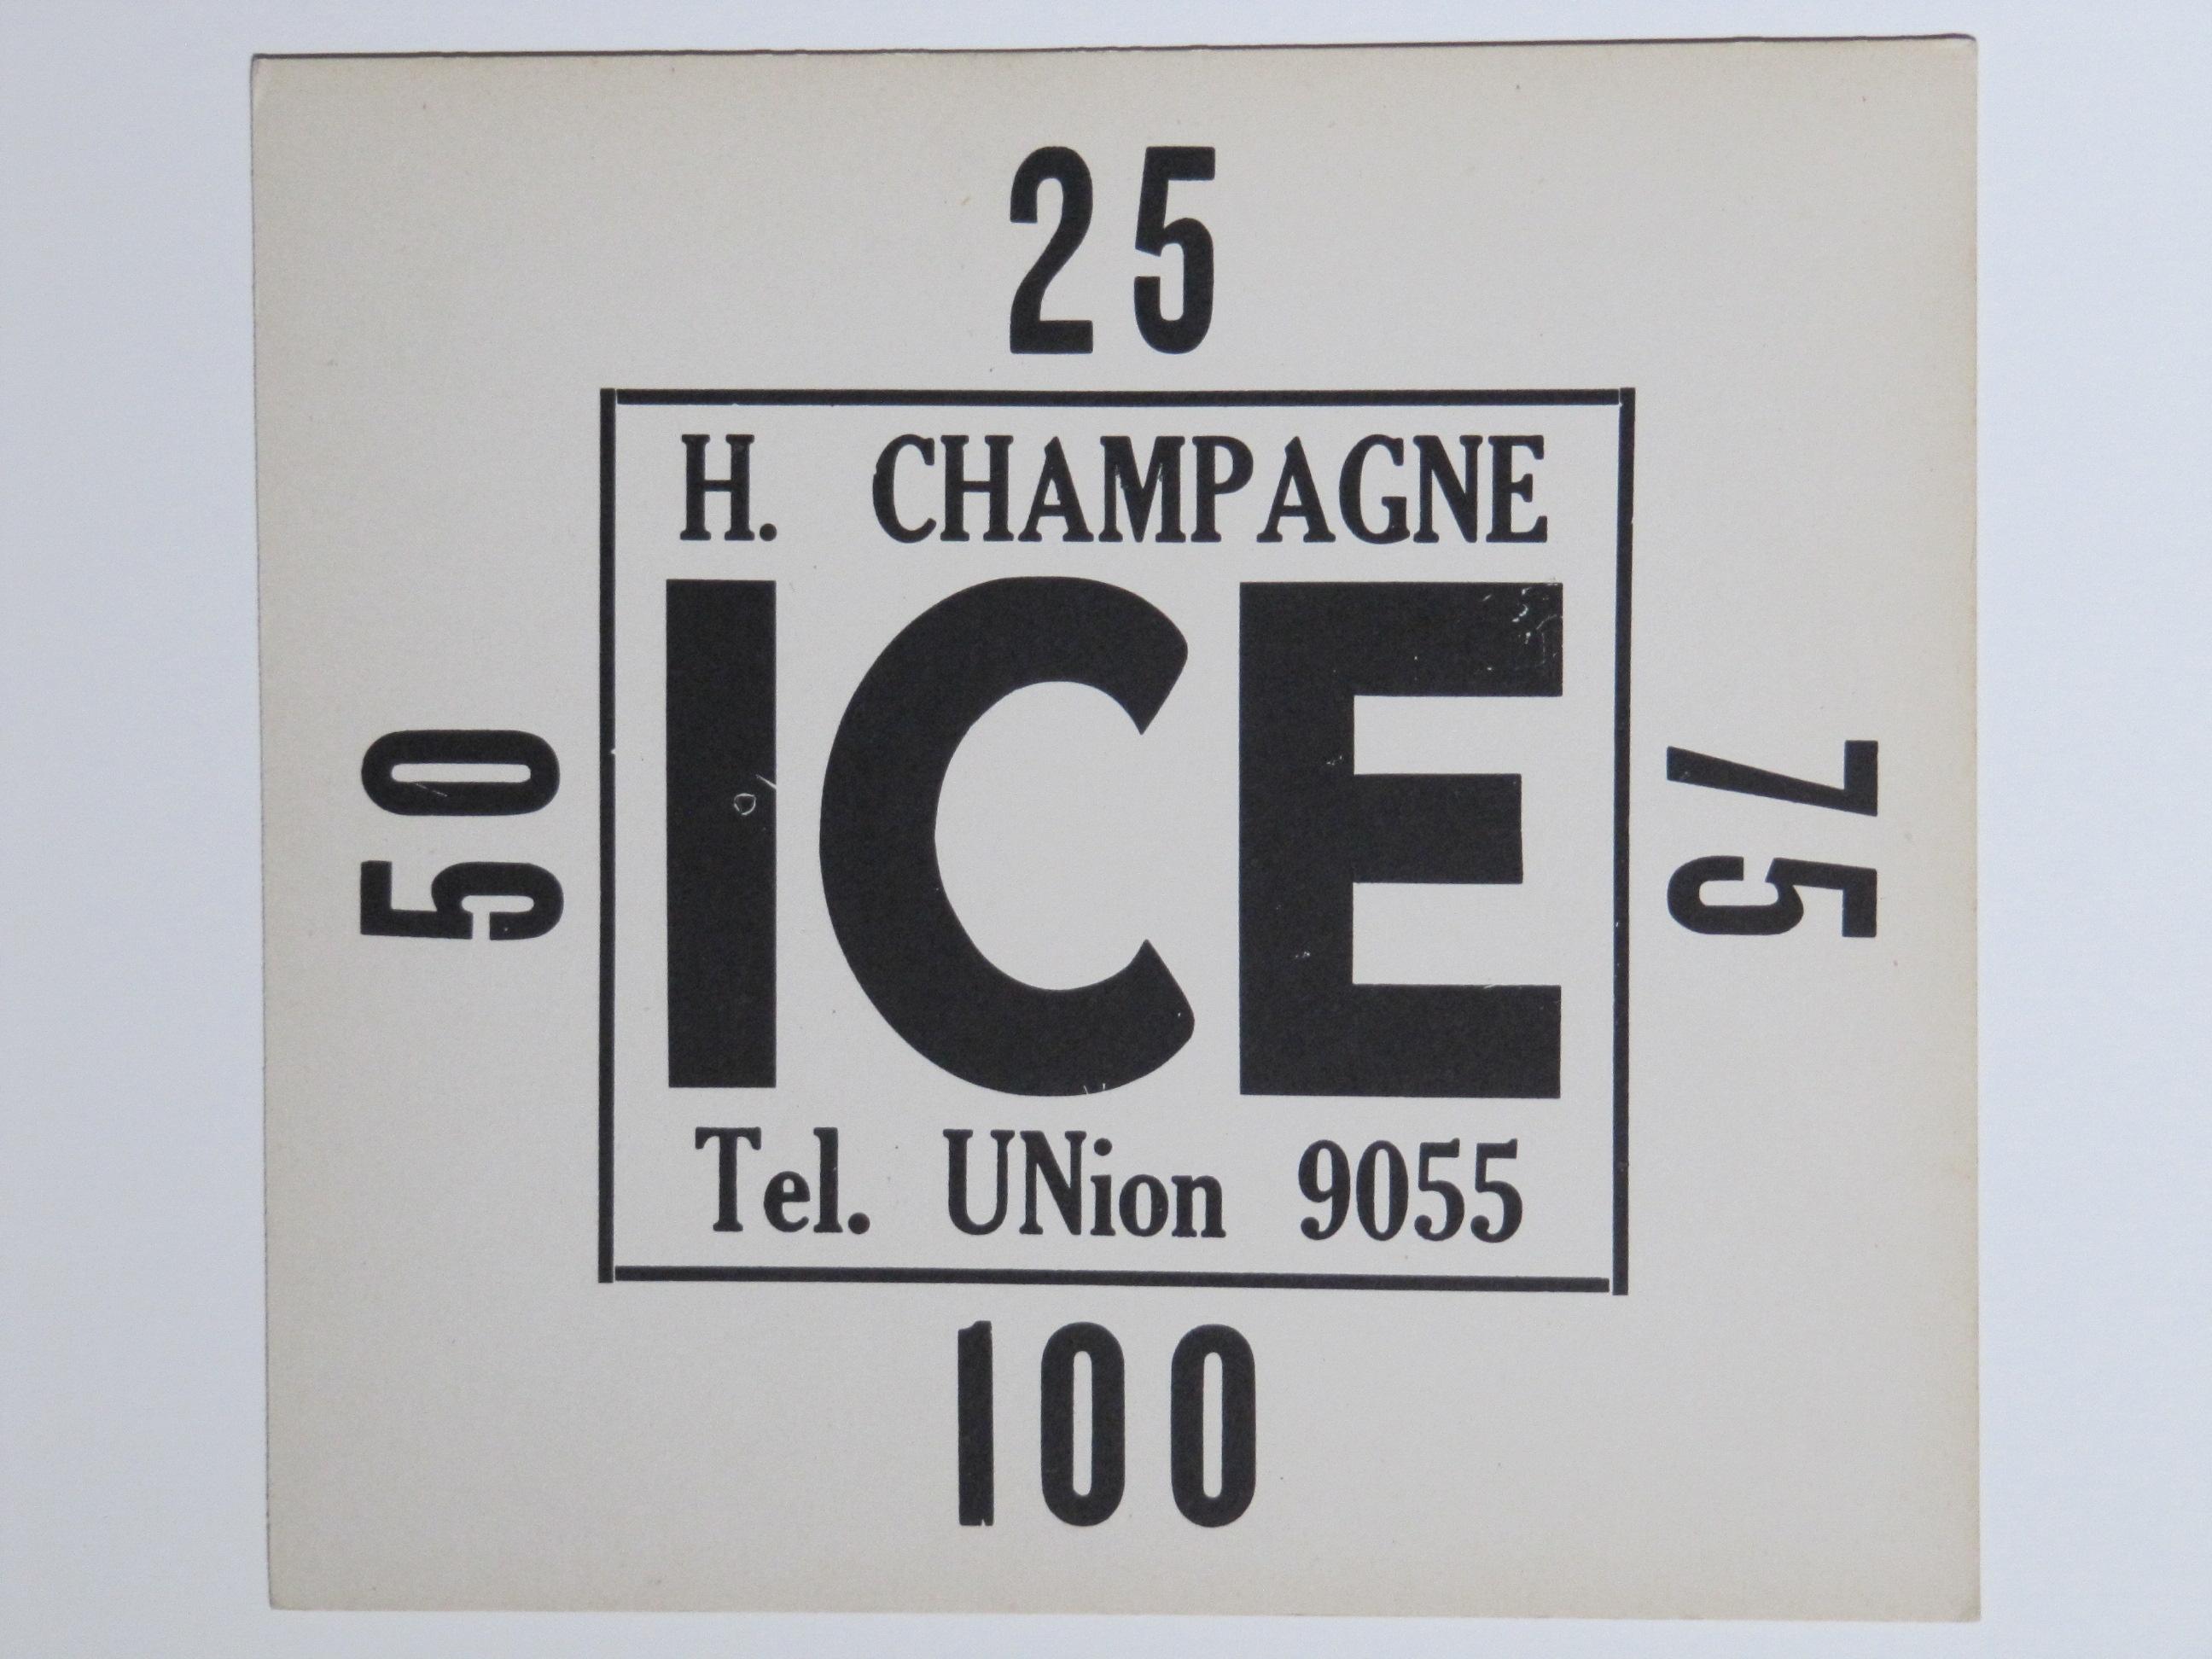 H Champagne